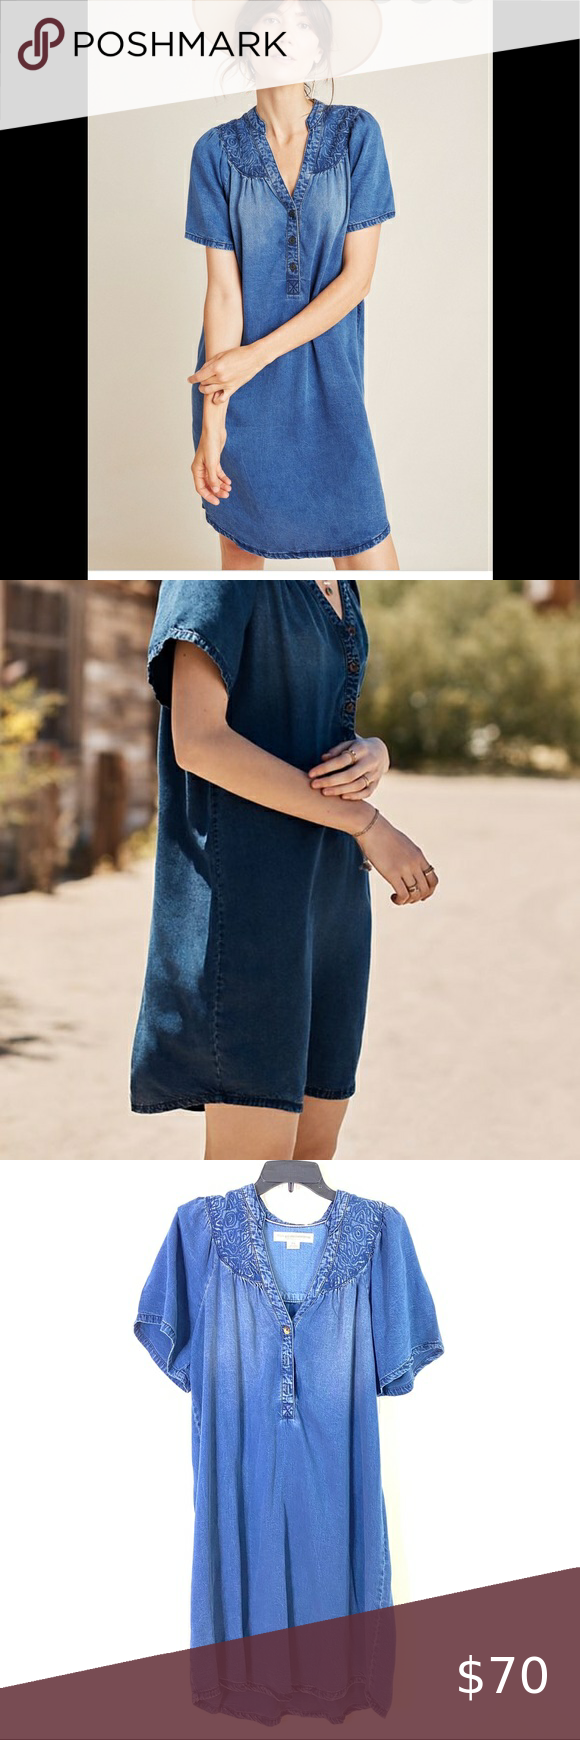 14+ Anthropologie pilcro denim dress inspirations